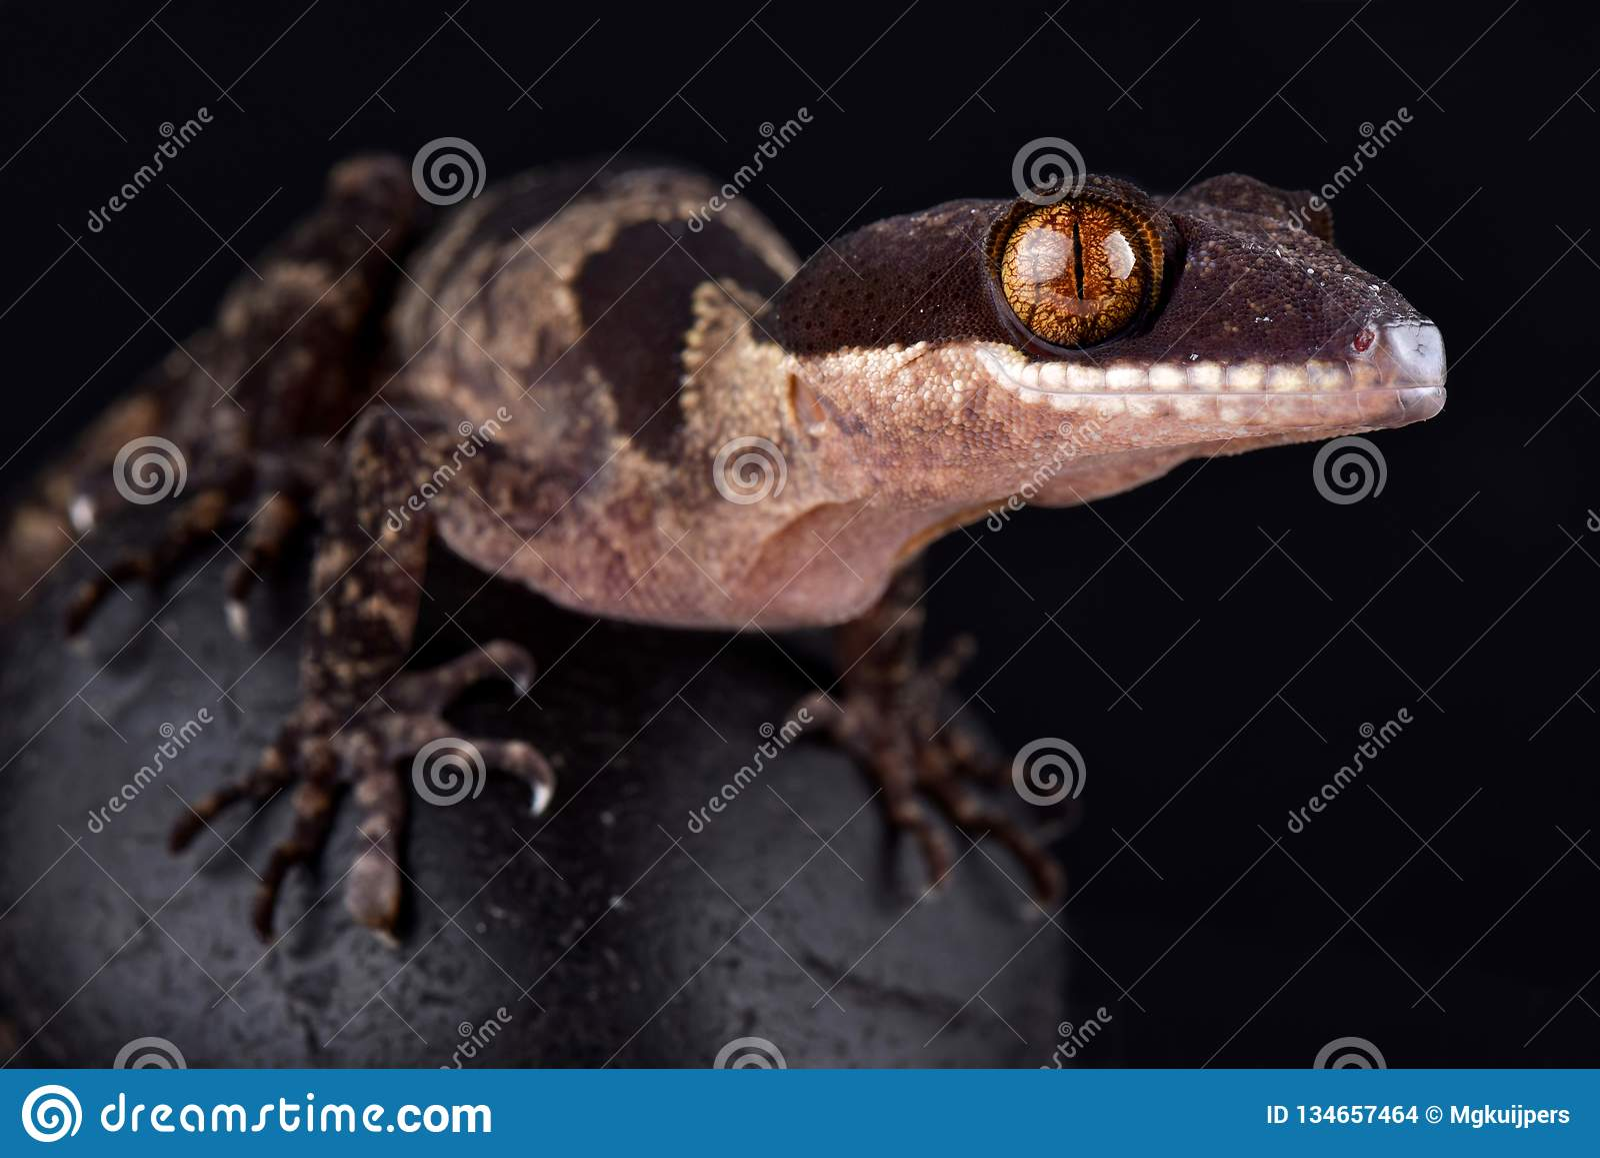 Louisiadensis gigante de Cyrtodactylus do geco unido de Papua